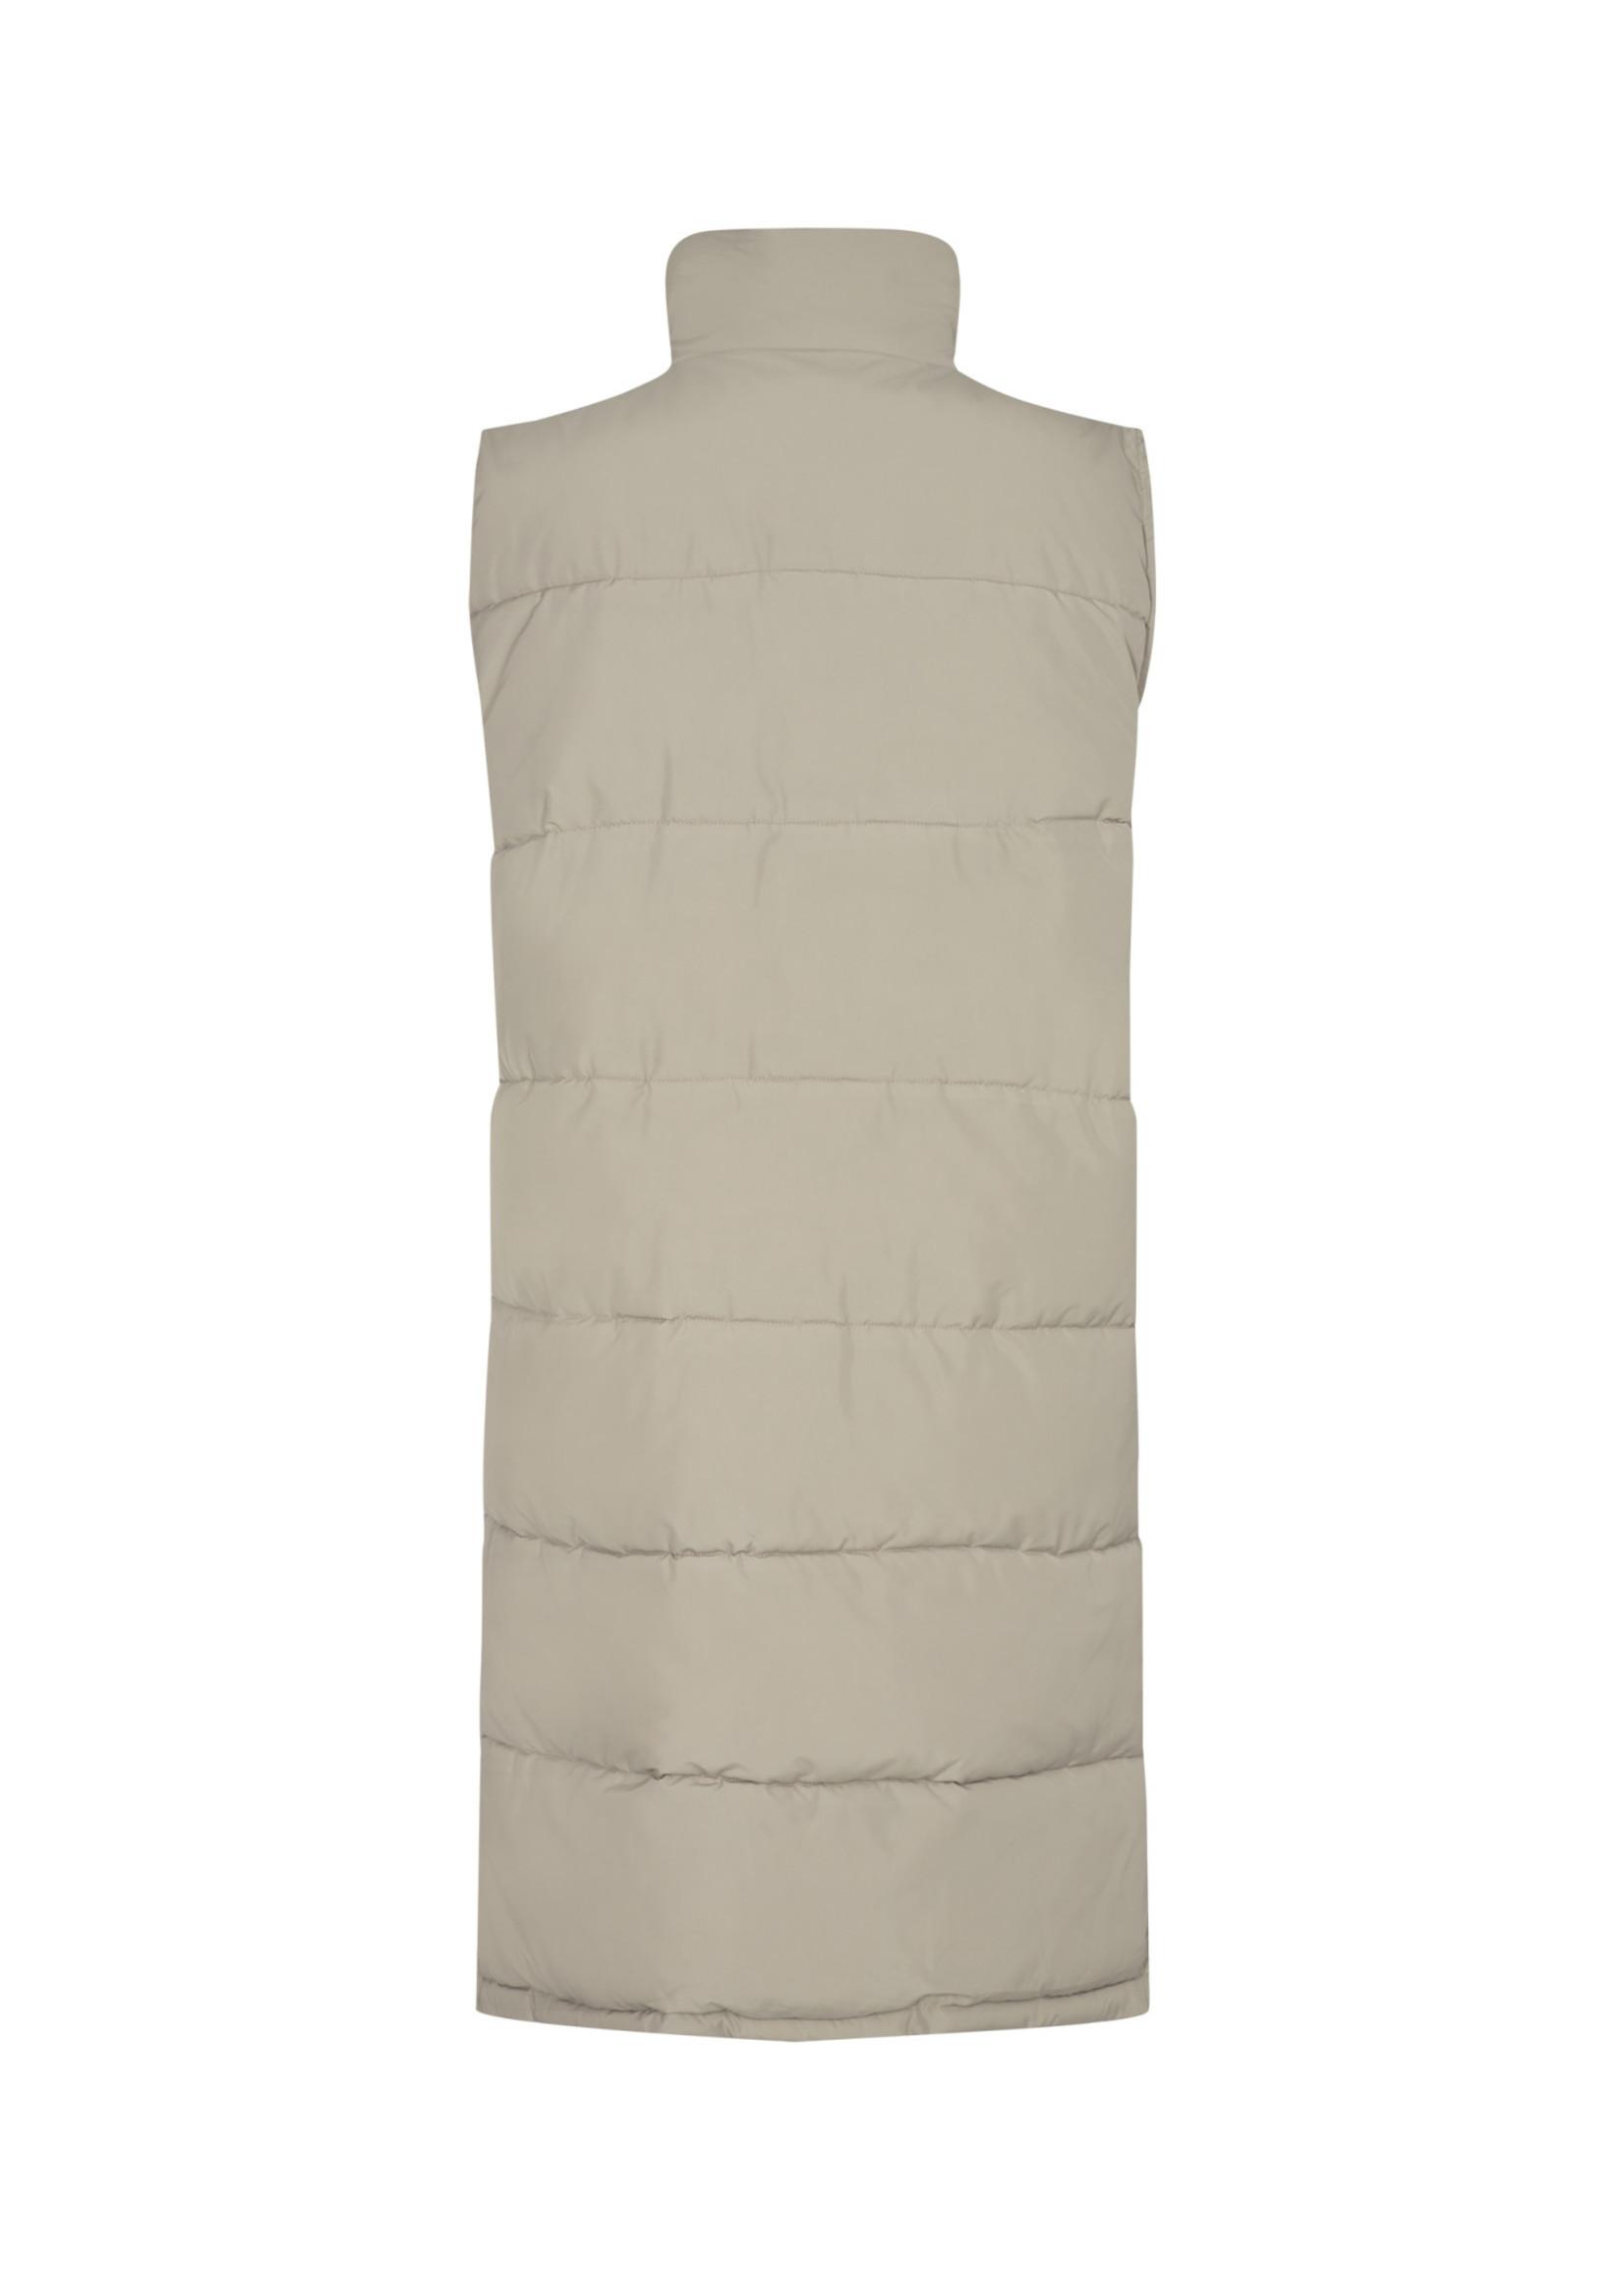 LeveteRoom GIBELLA 5 Body vest lang